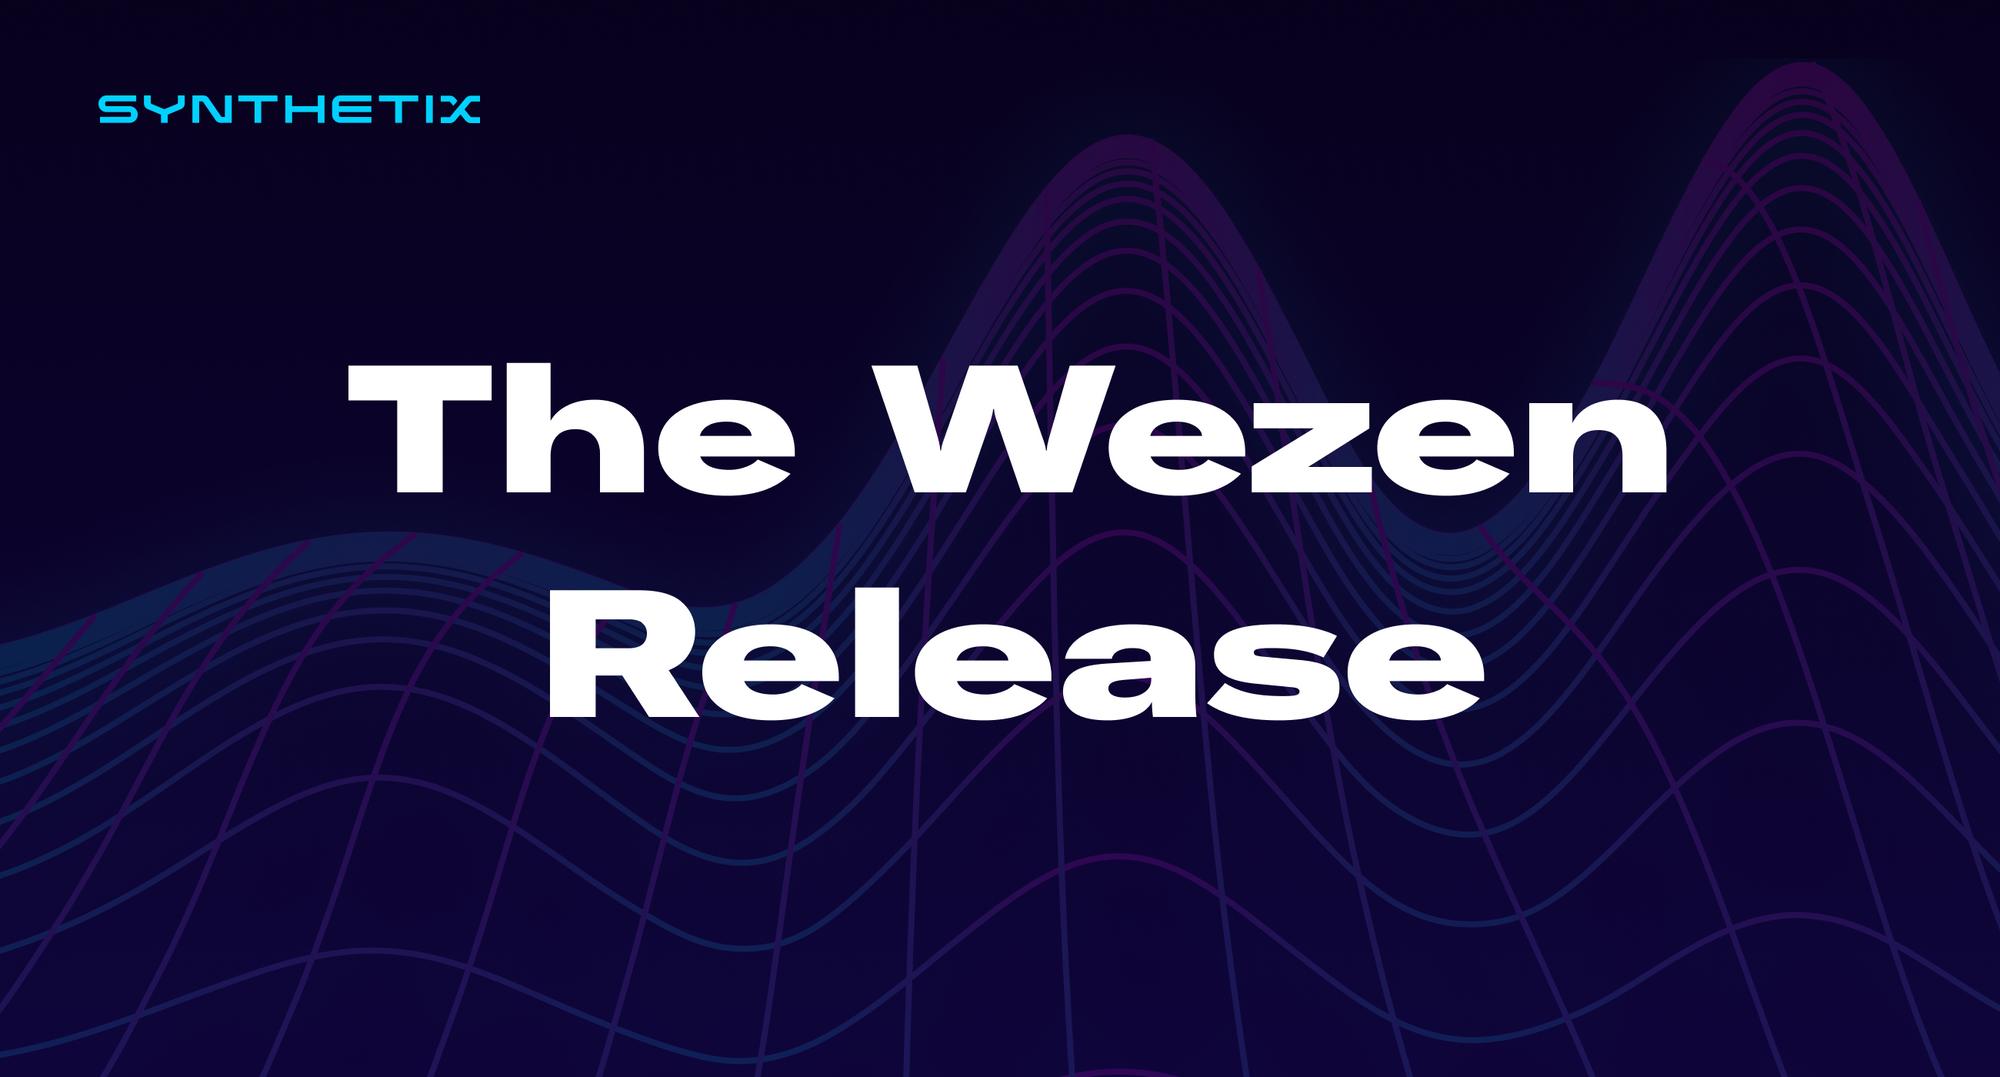 The Wezen Release